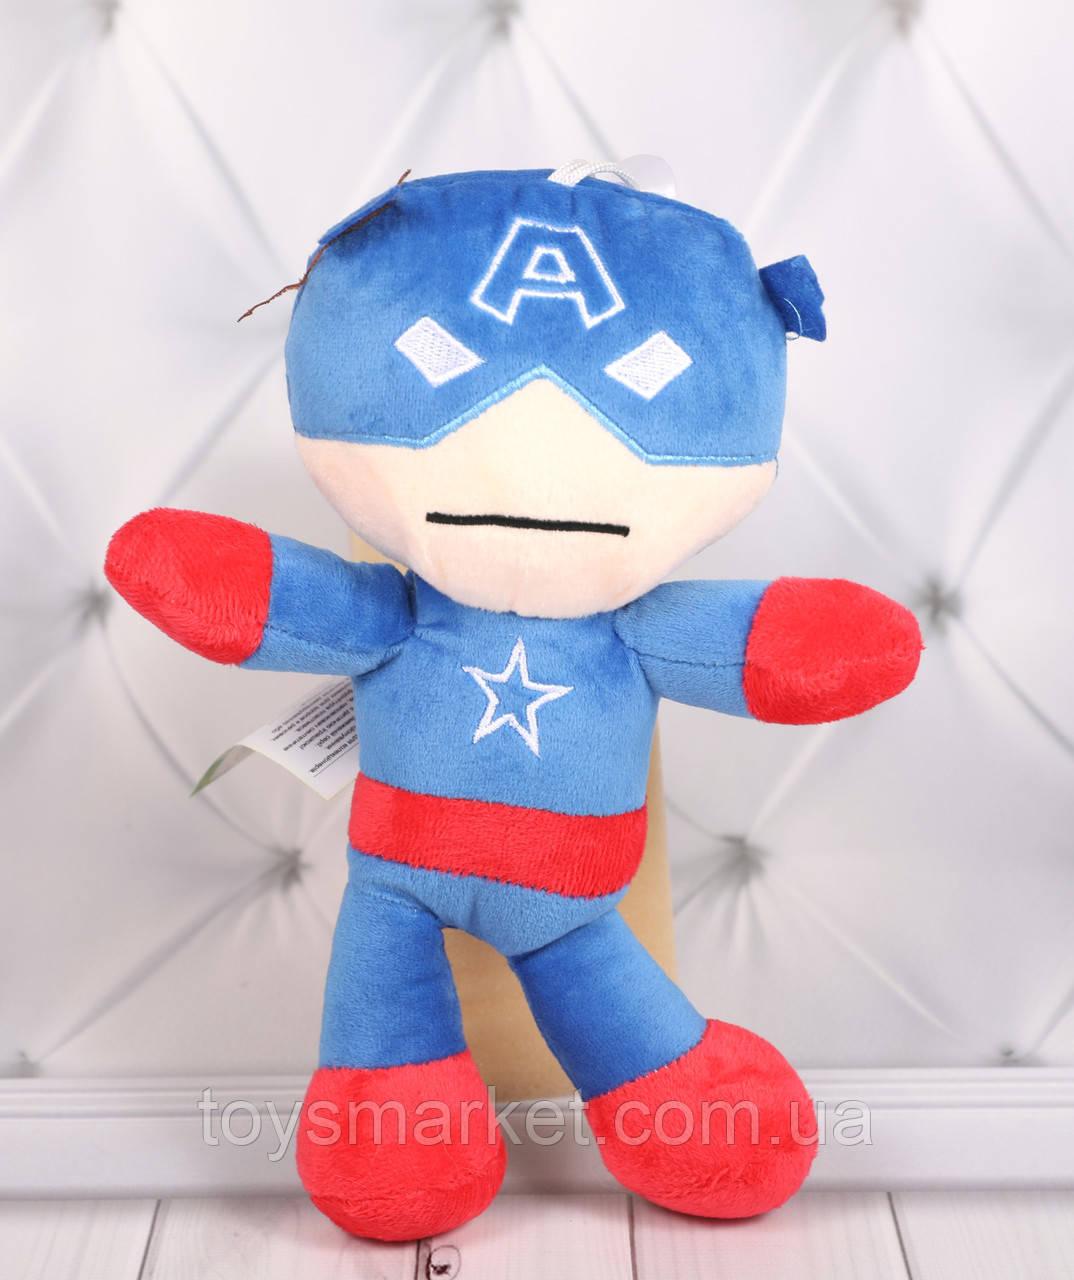 Мягкая игрушка Капитан Америка, плюшевая игрушка Капитан Америка, 25 см.